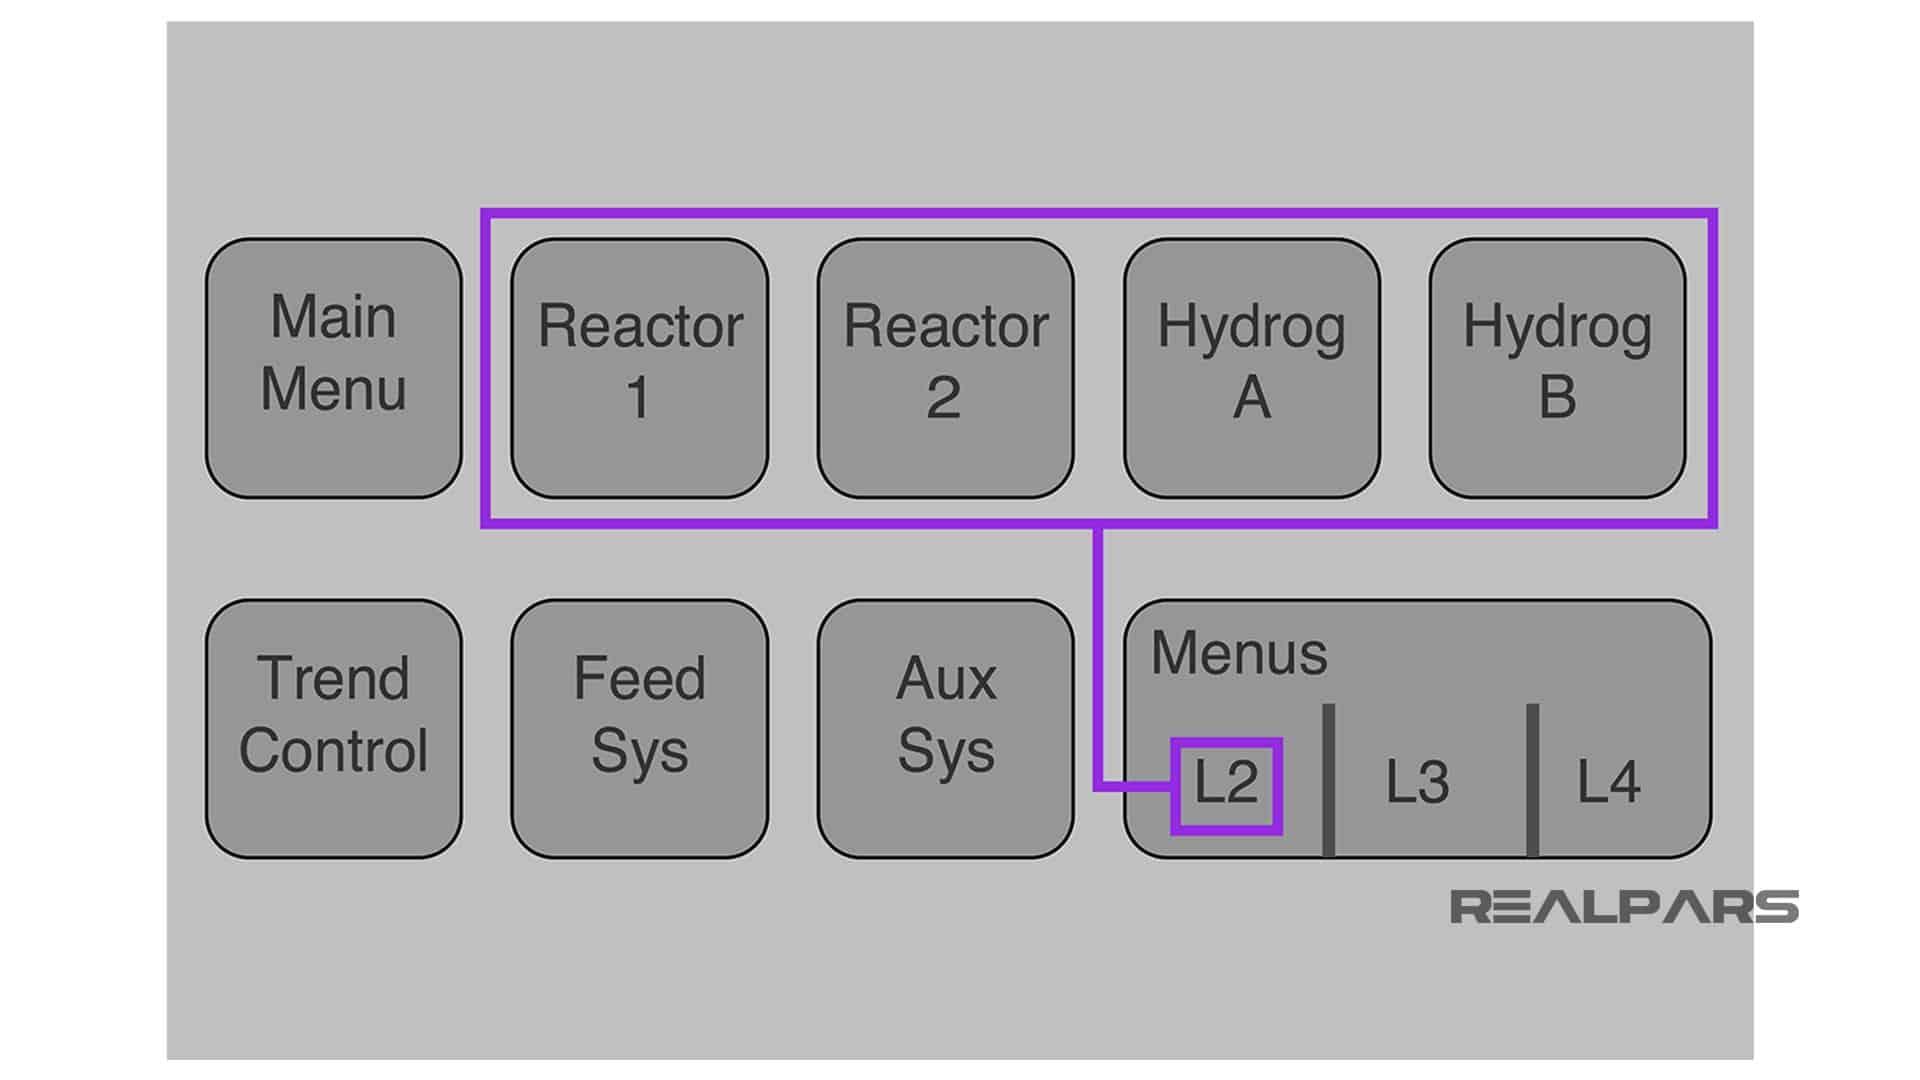 Benefits-of-Level-1-displays-easy-navigation